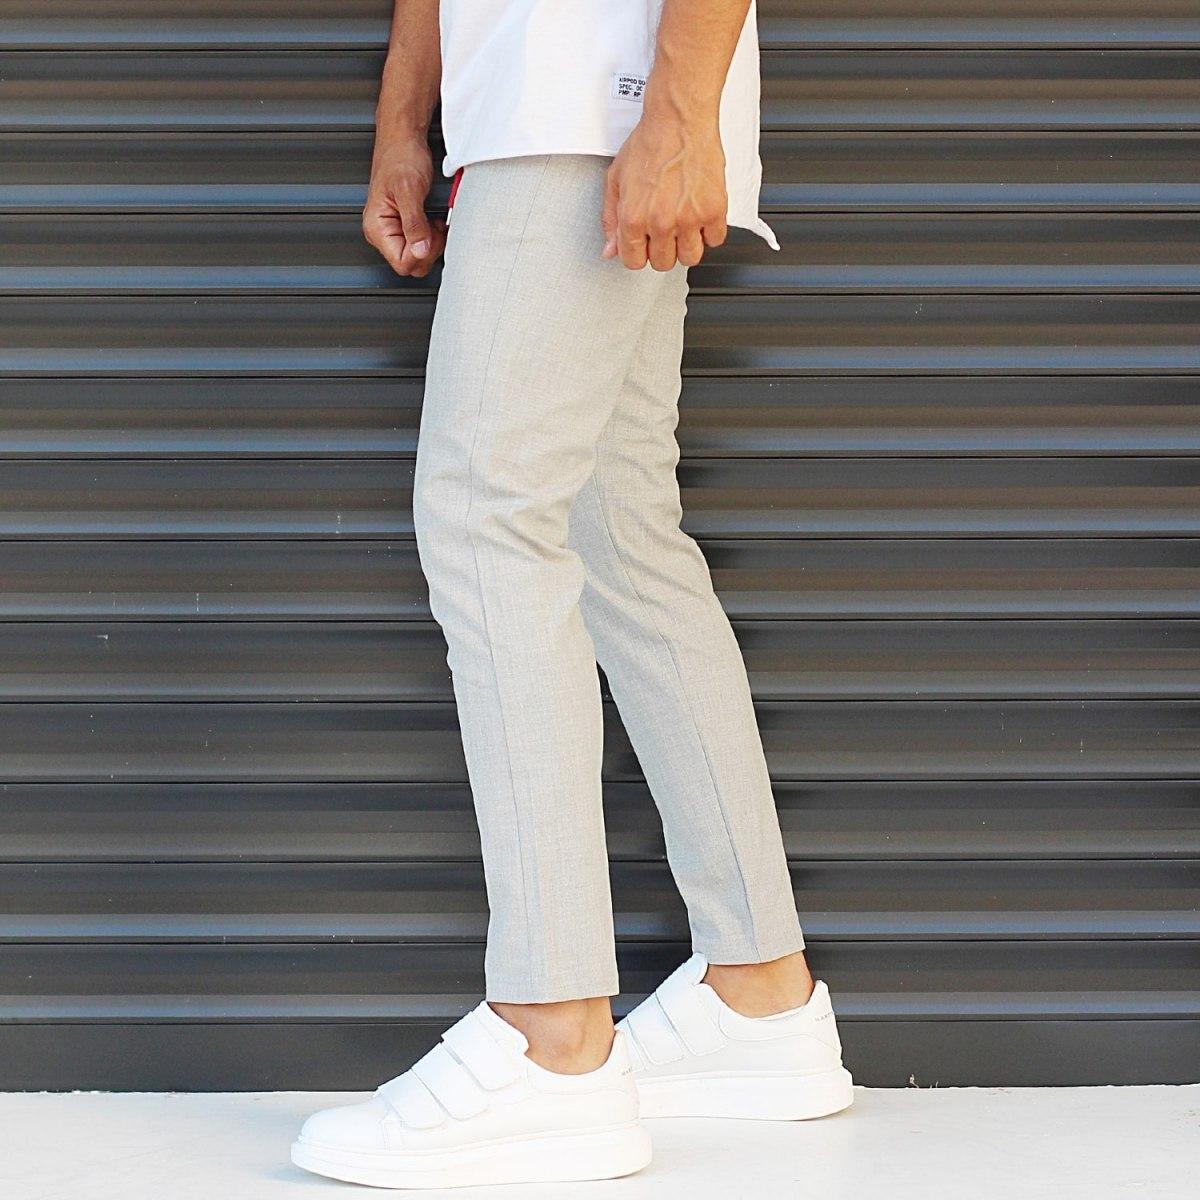 Men's Slim Fit Lycra Sport Pants Cream Mv Premium Brand - 3